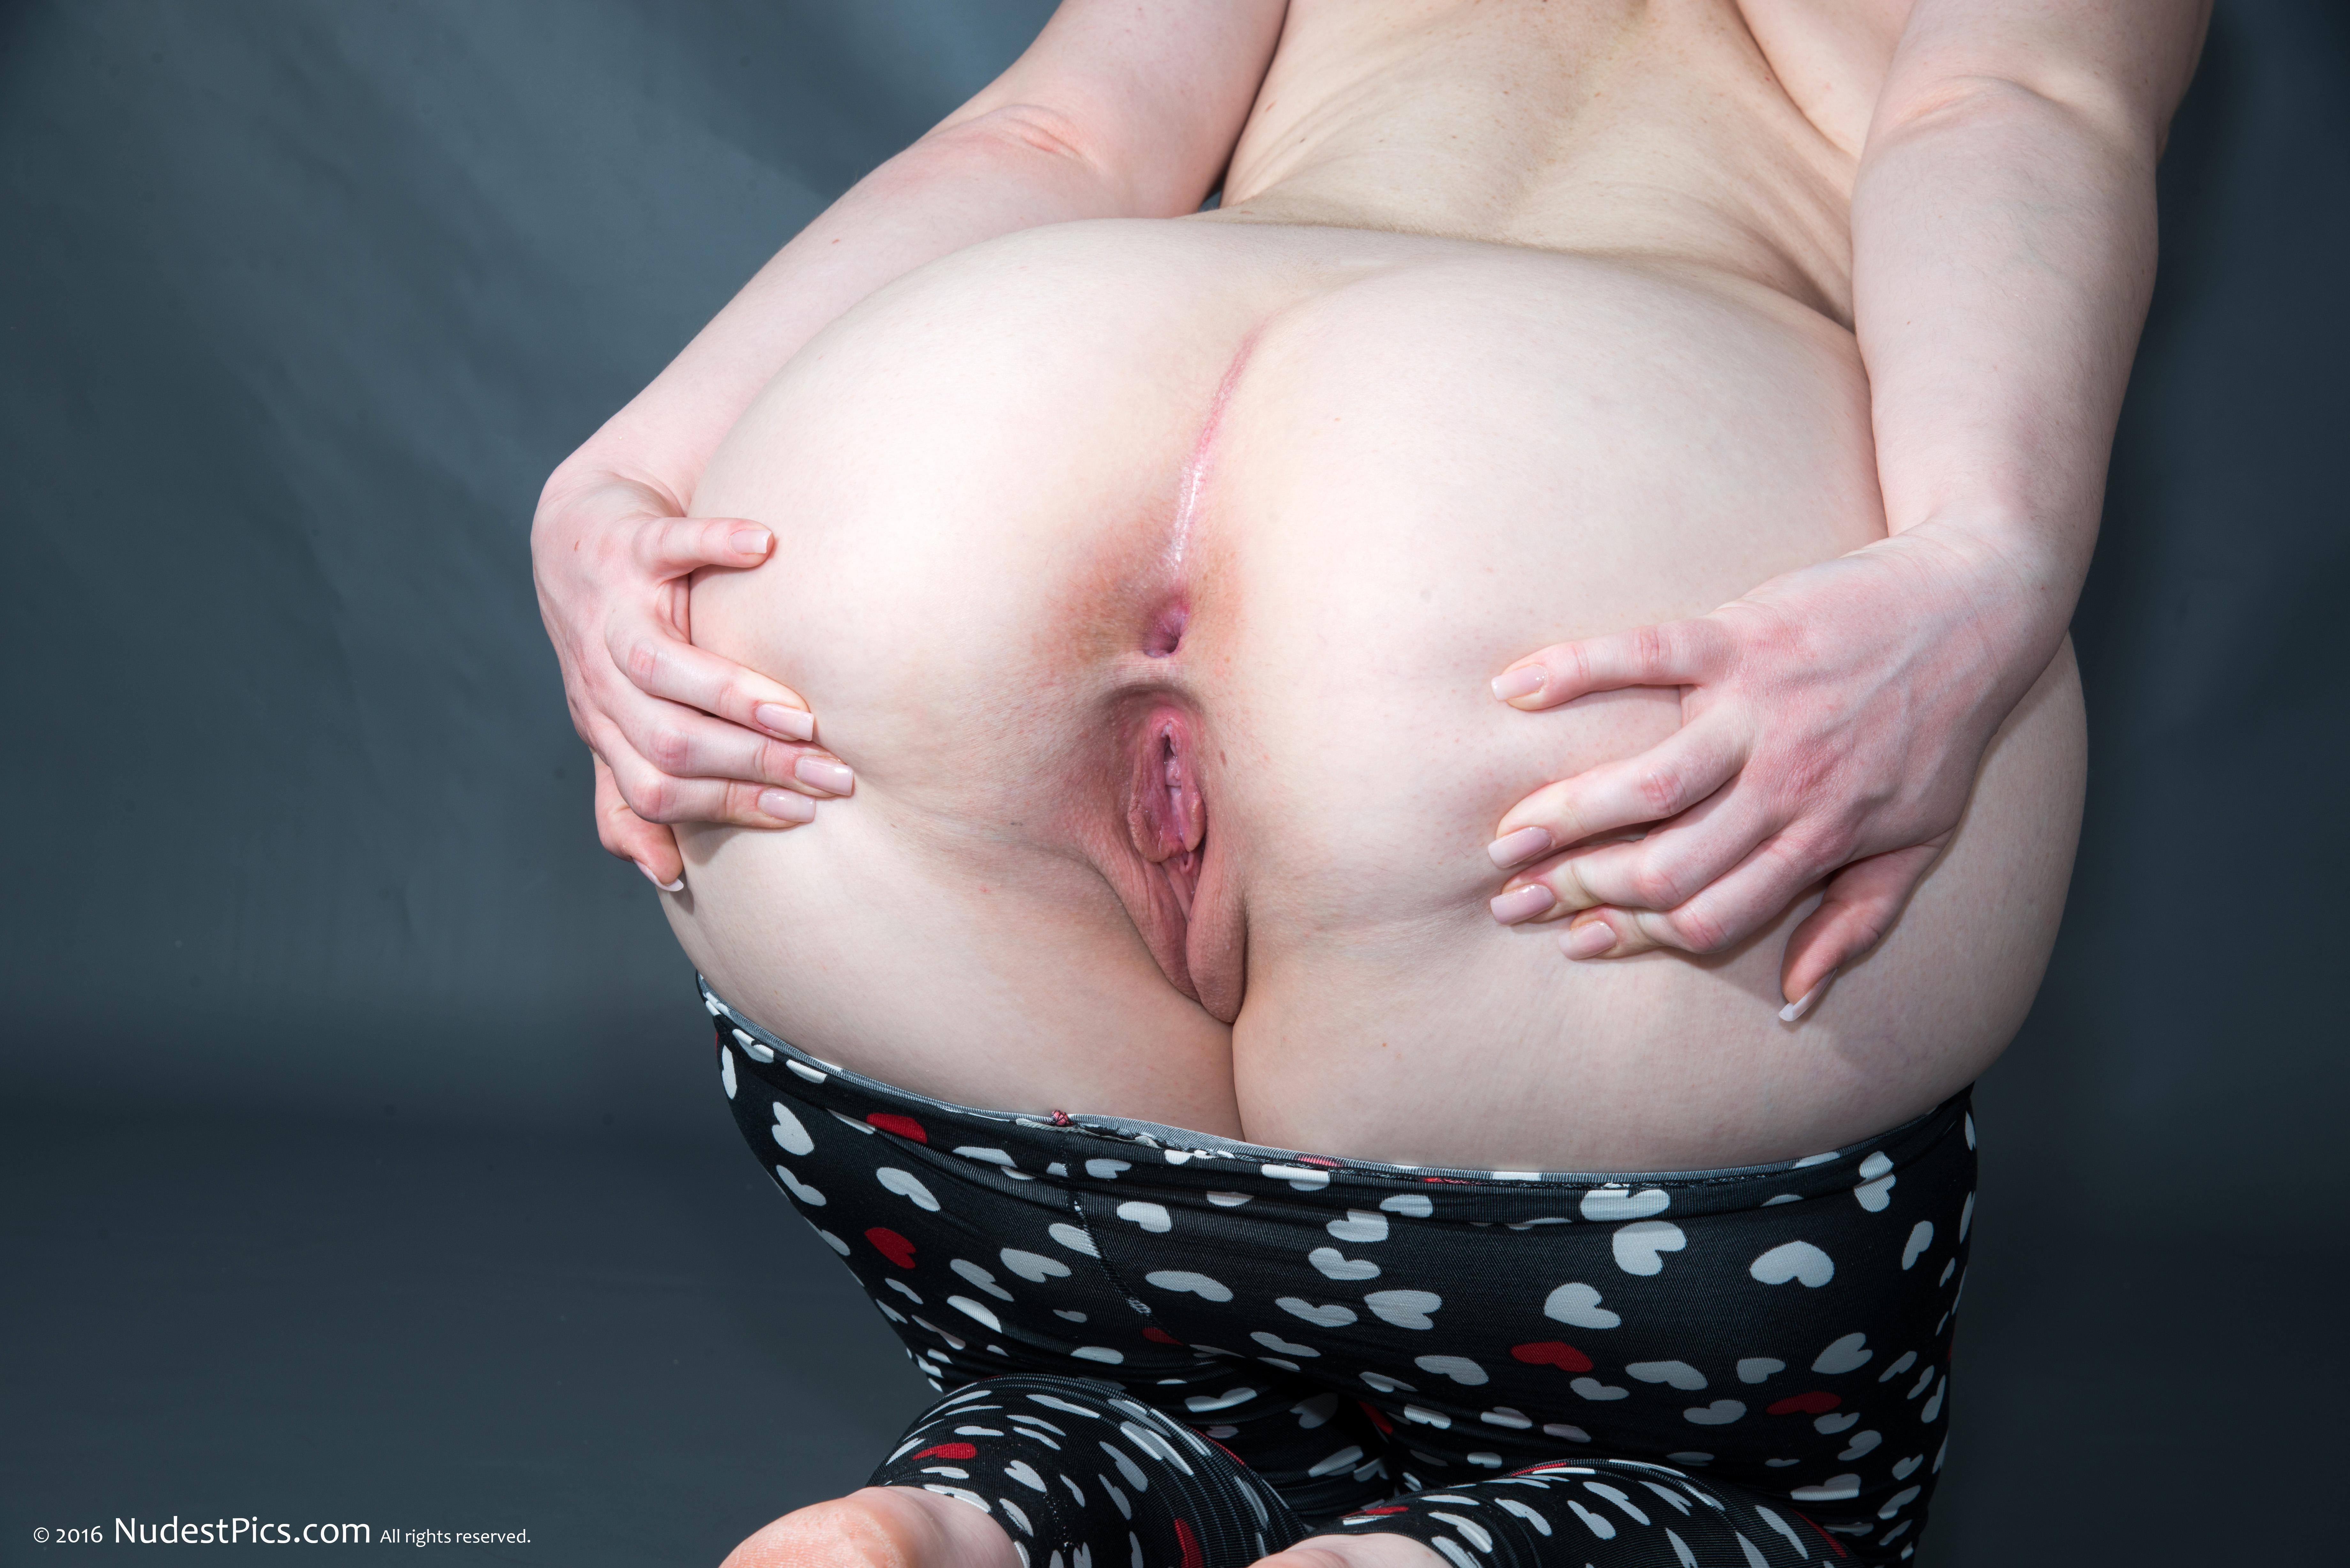 Bbw big ass hd